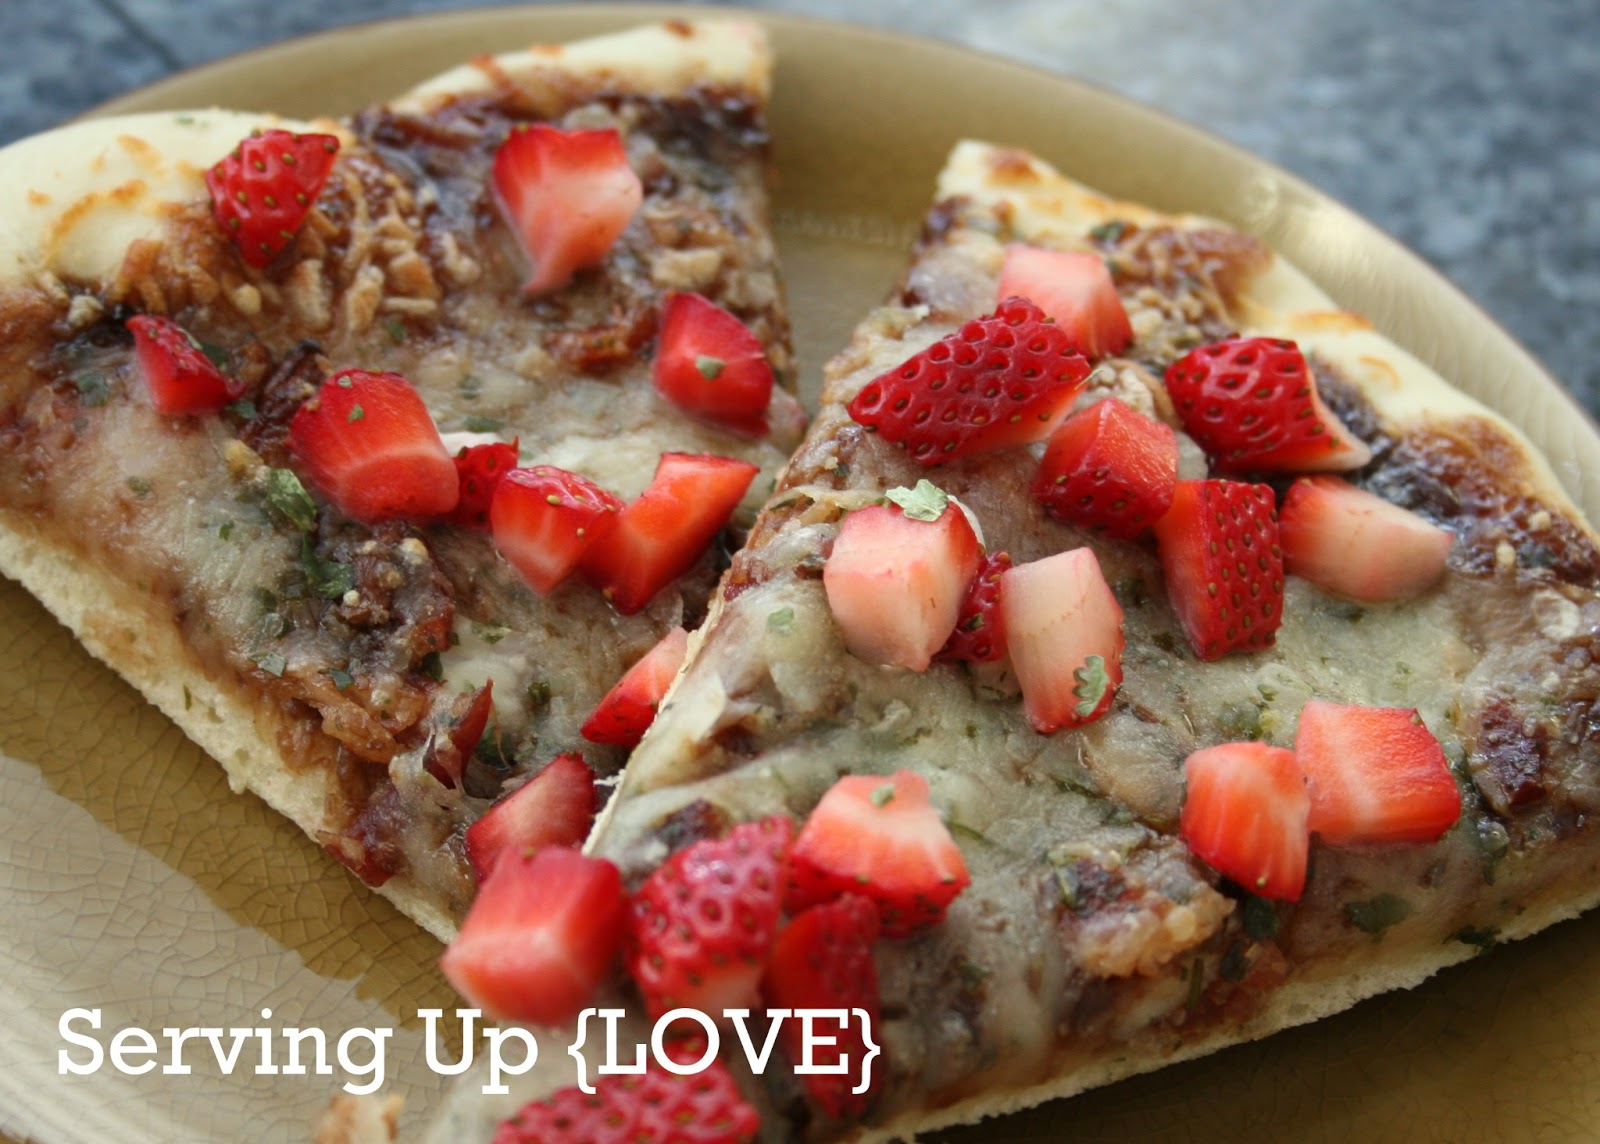 Katherine's Kitchen: Serving Up {Pizza}: Balsamic Strawberry Pizza